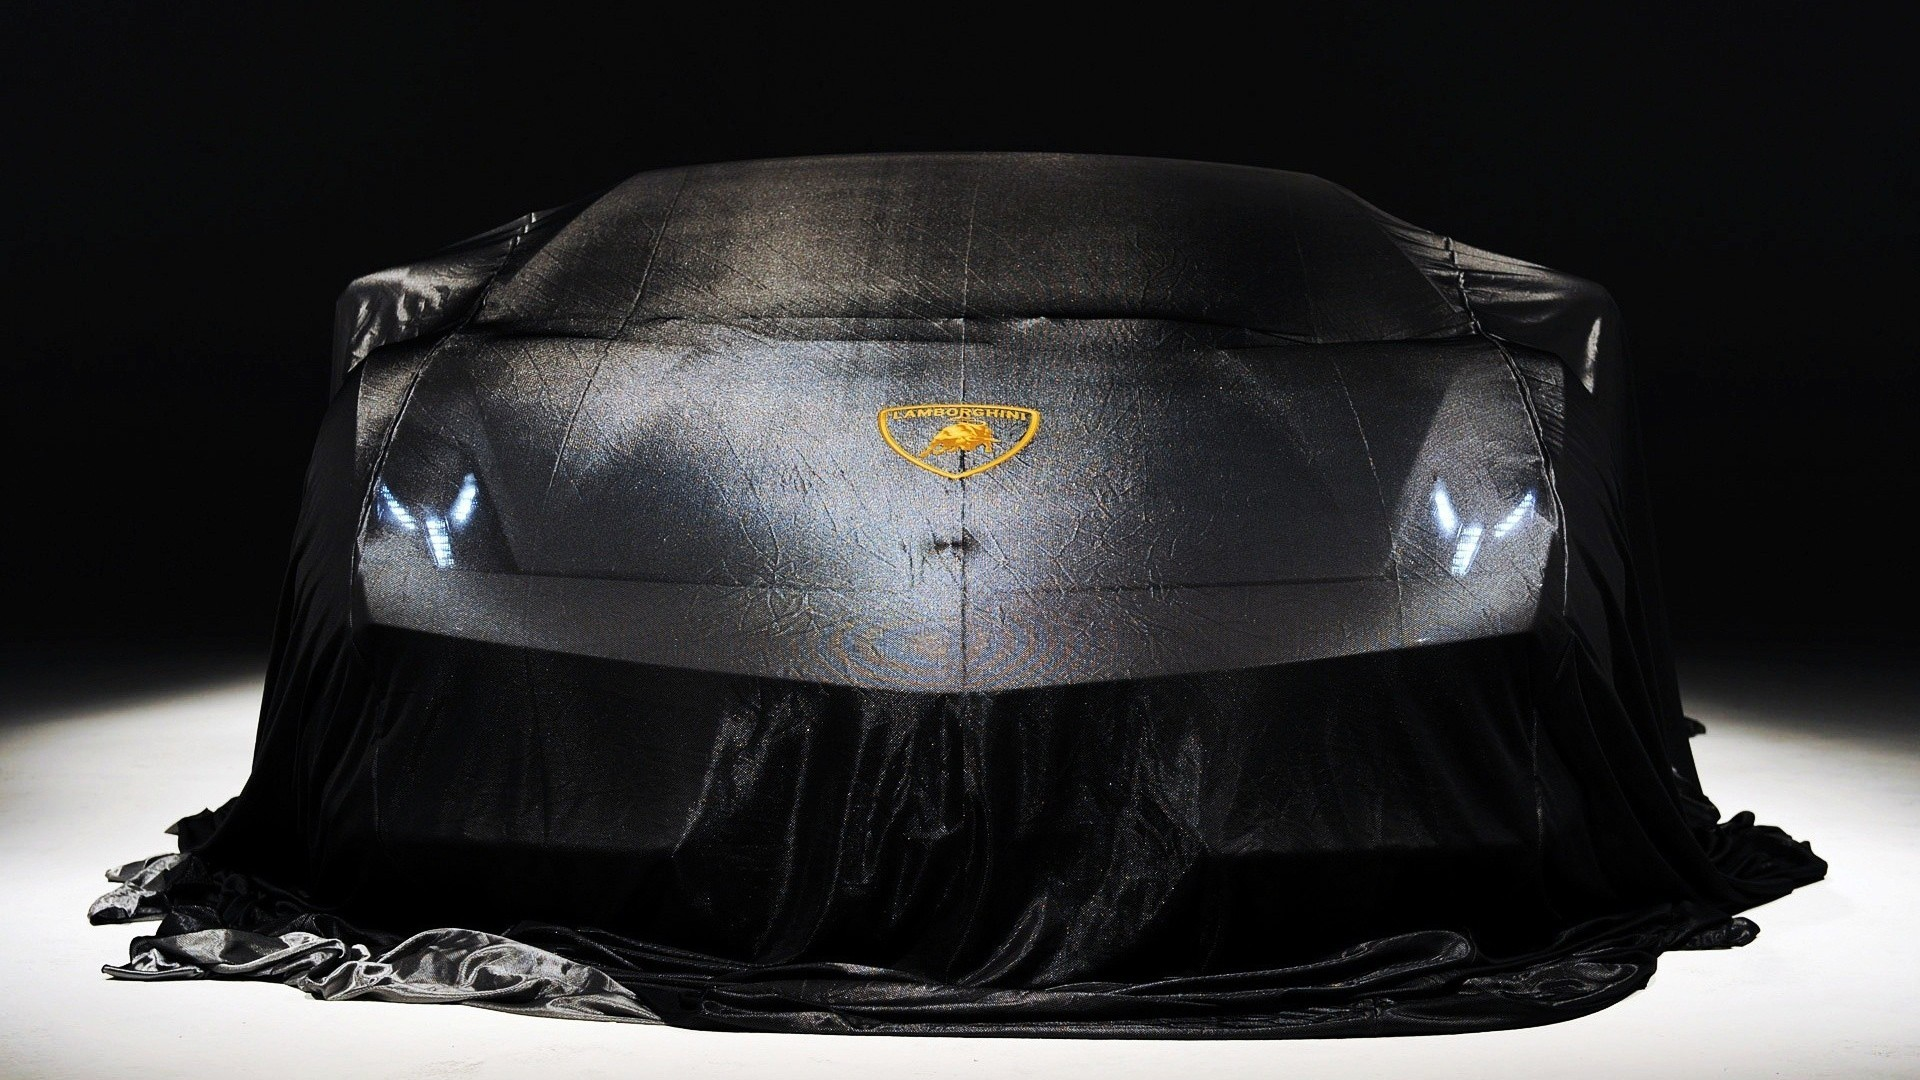 Lamborghini 2014 in Cover HD Wallpaper